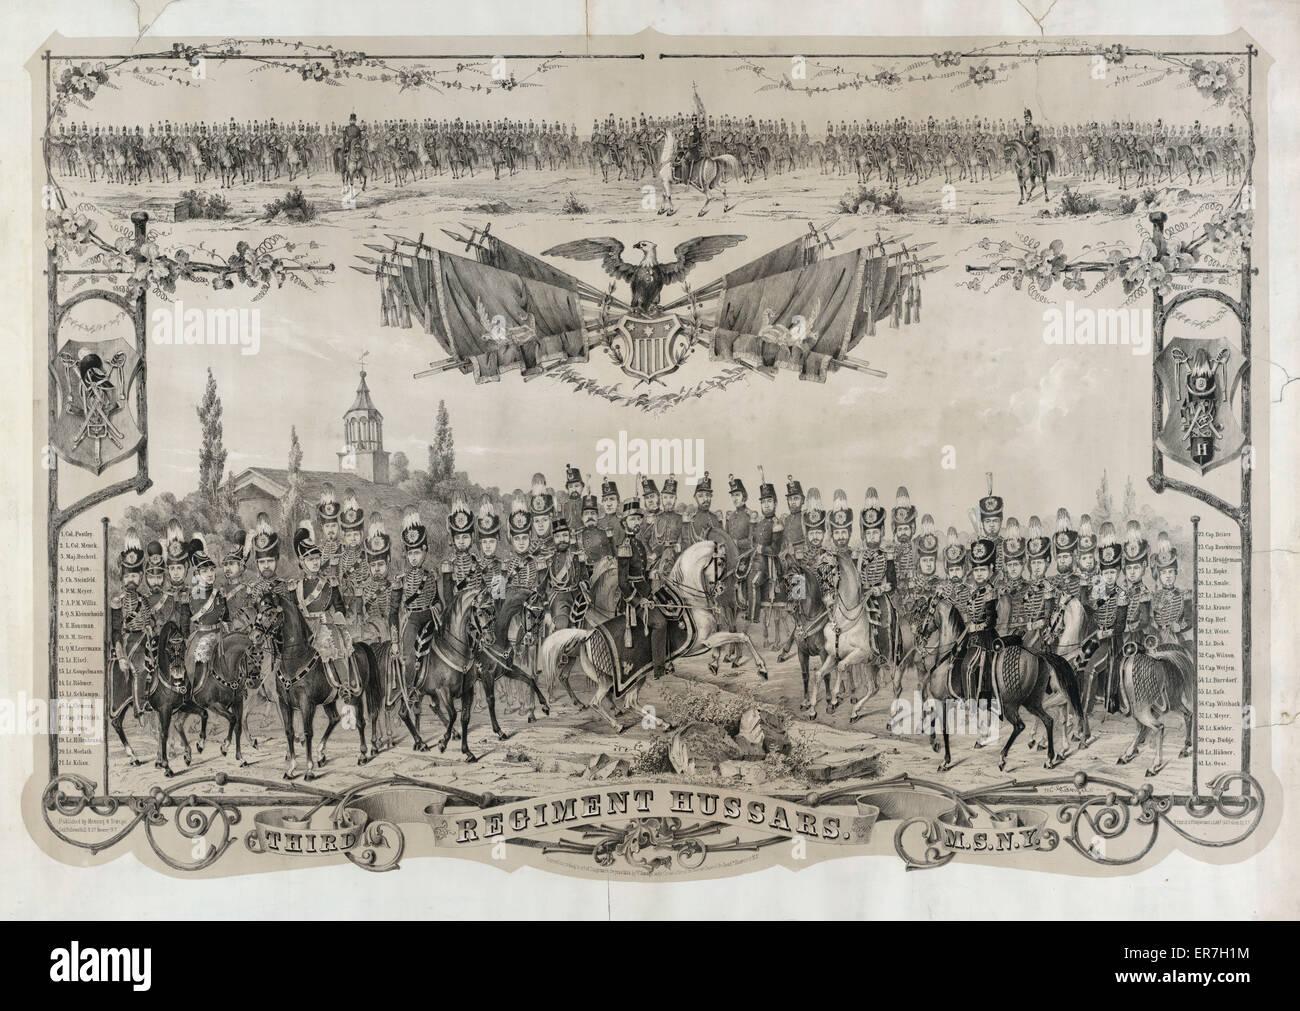 Third Regiment Hussars M.S.N.Y. Date c1856. - Stock Image